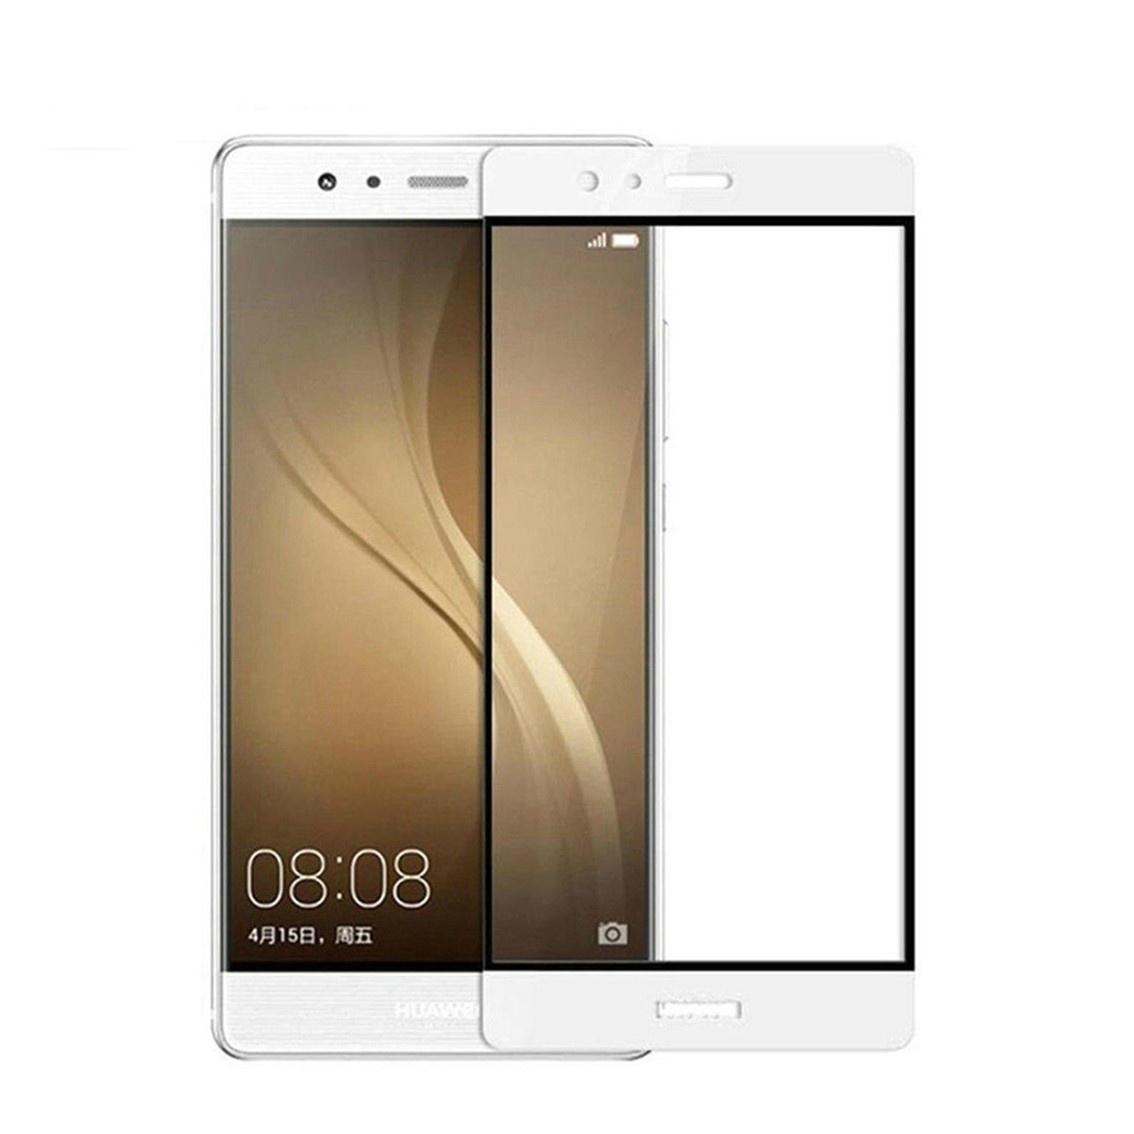 Защитное стекло Glass PRO (Full) Screen для Huawei P9 цветное белая рамкадля Huawei<br>Защитное стекло Glass PRO (Full) Screen для Huawei P9 цветное белая рамка<br>